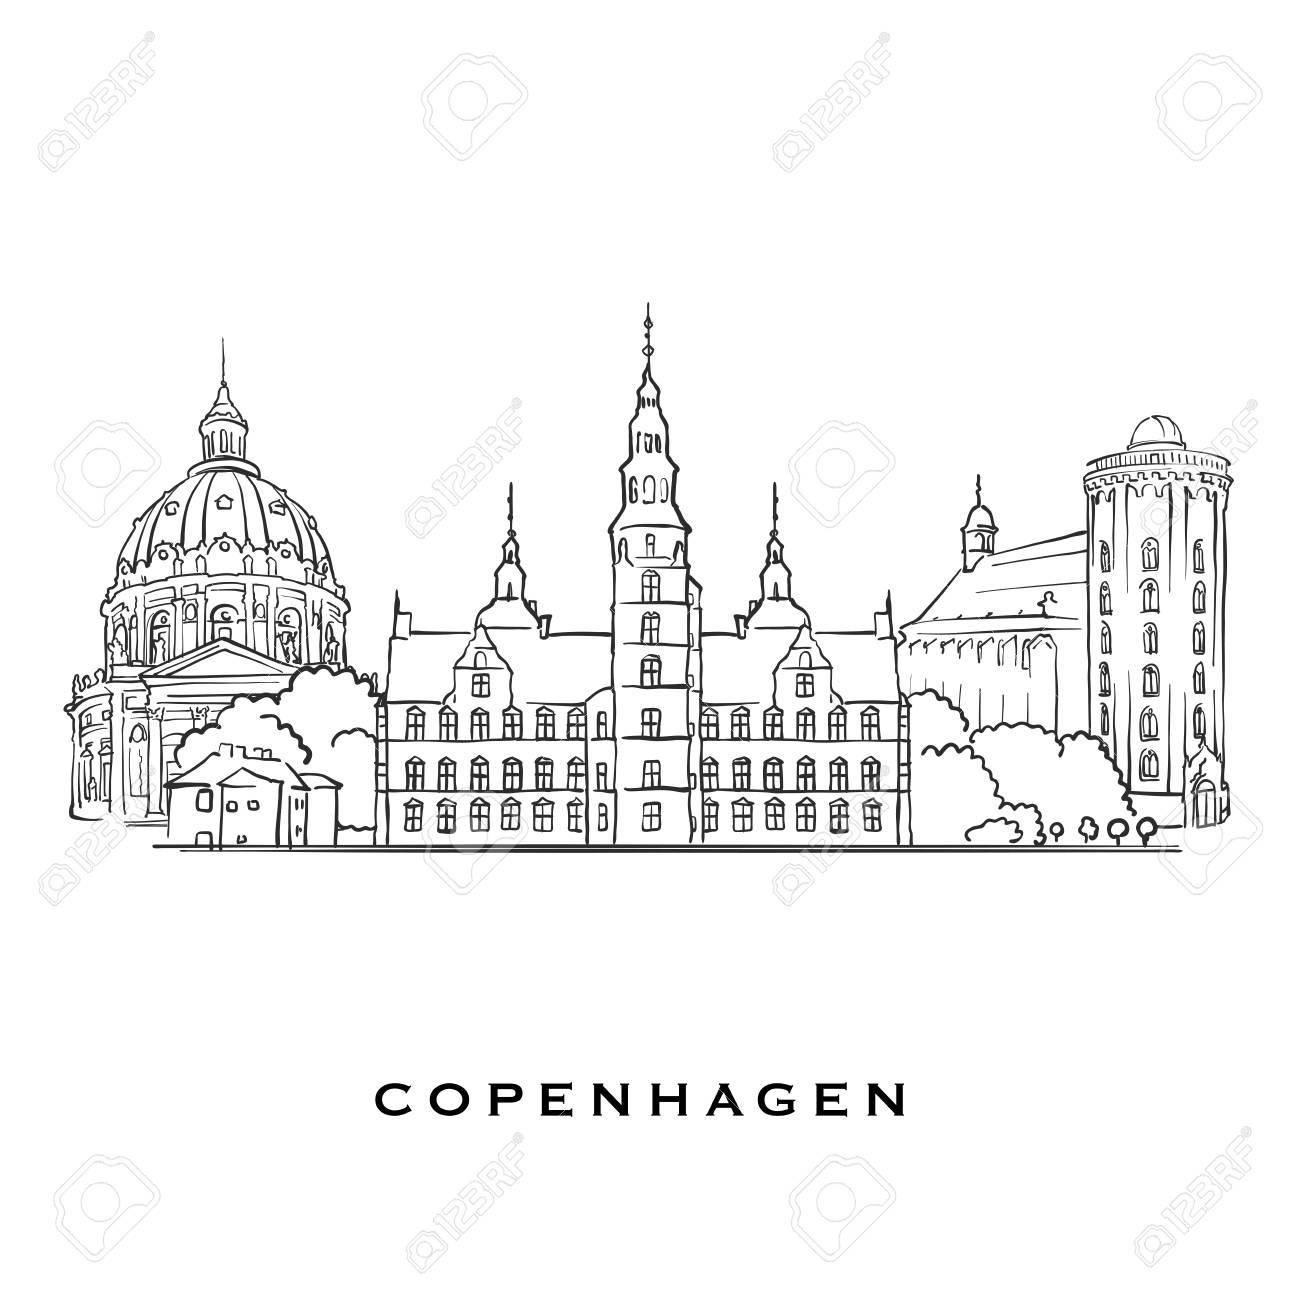 Copenhagen Denmark famous architecture  Outlined vector sketch